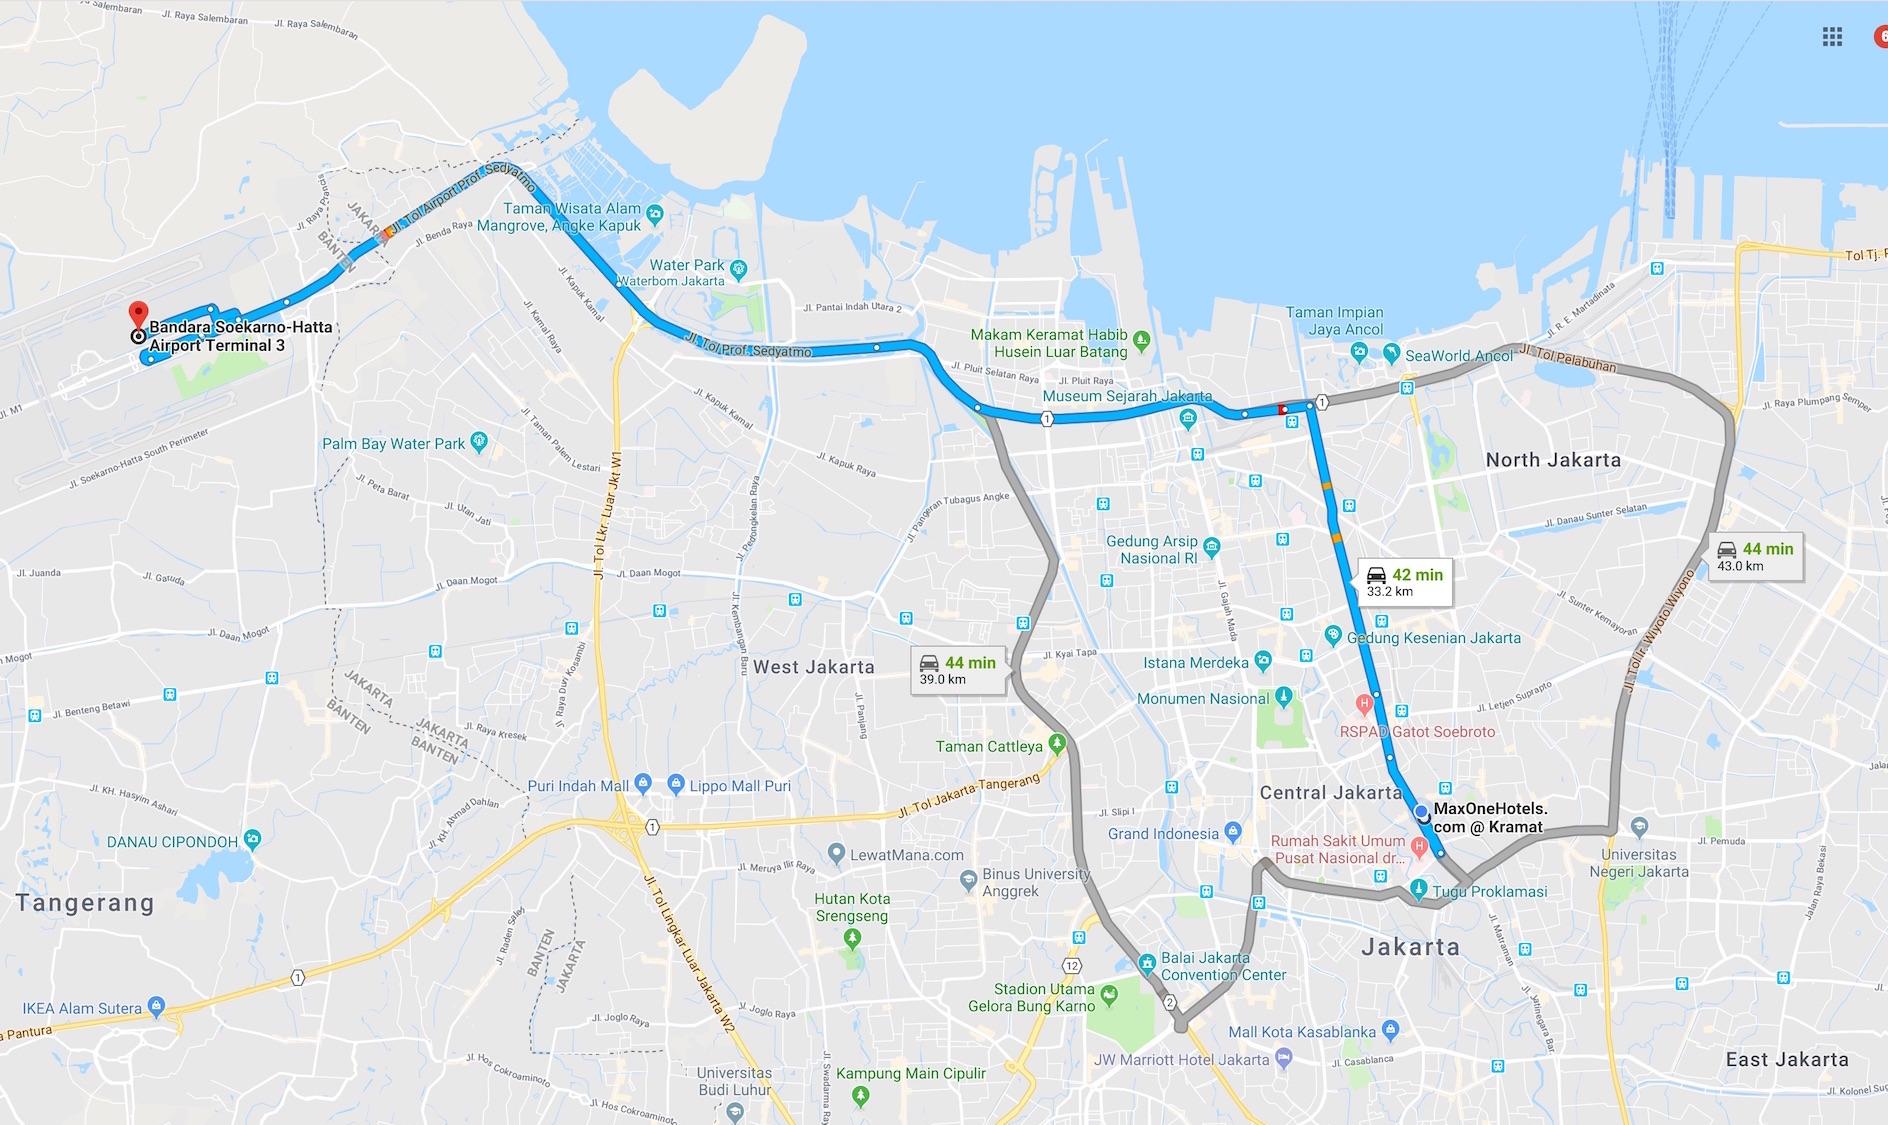 map jakarta airport terminal 3 to maxone hotel kramat